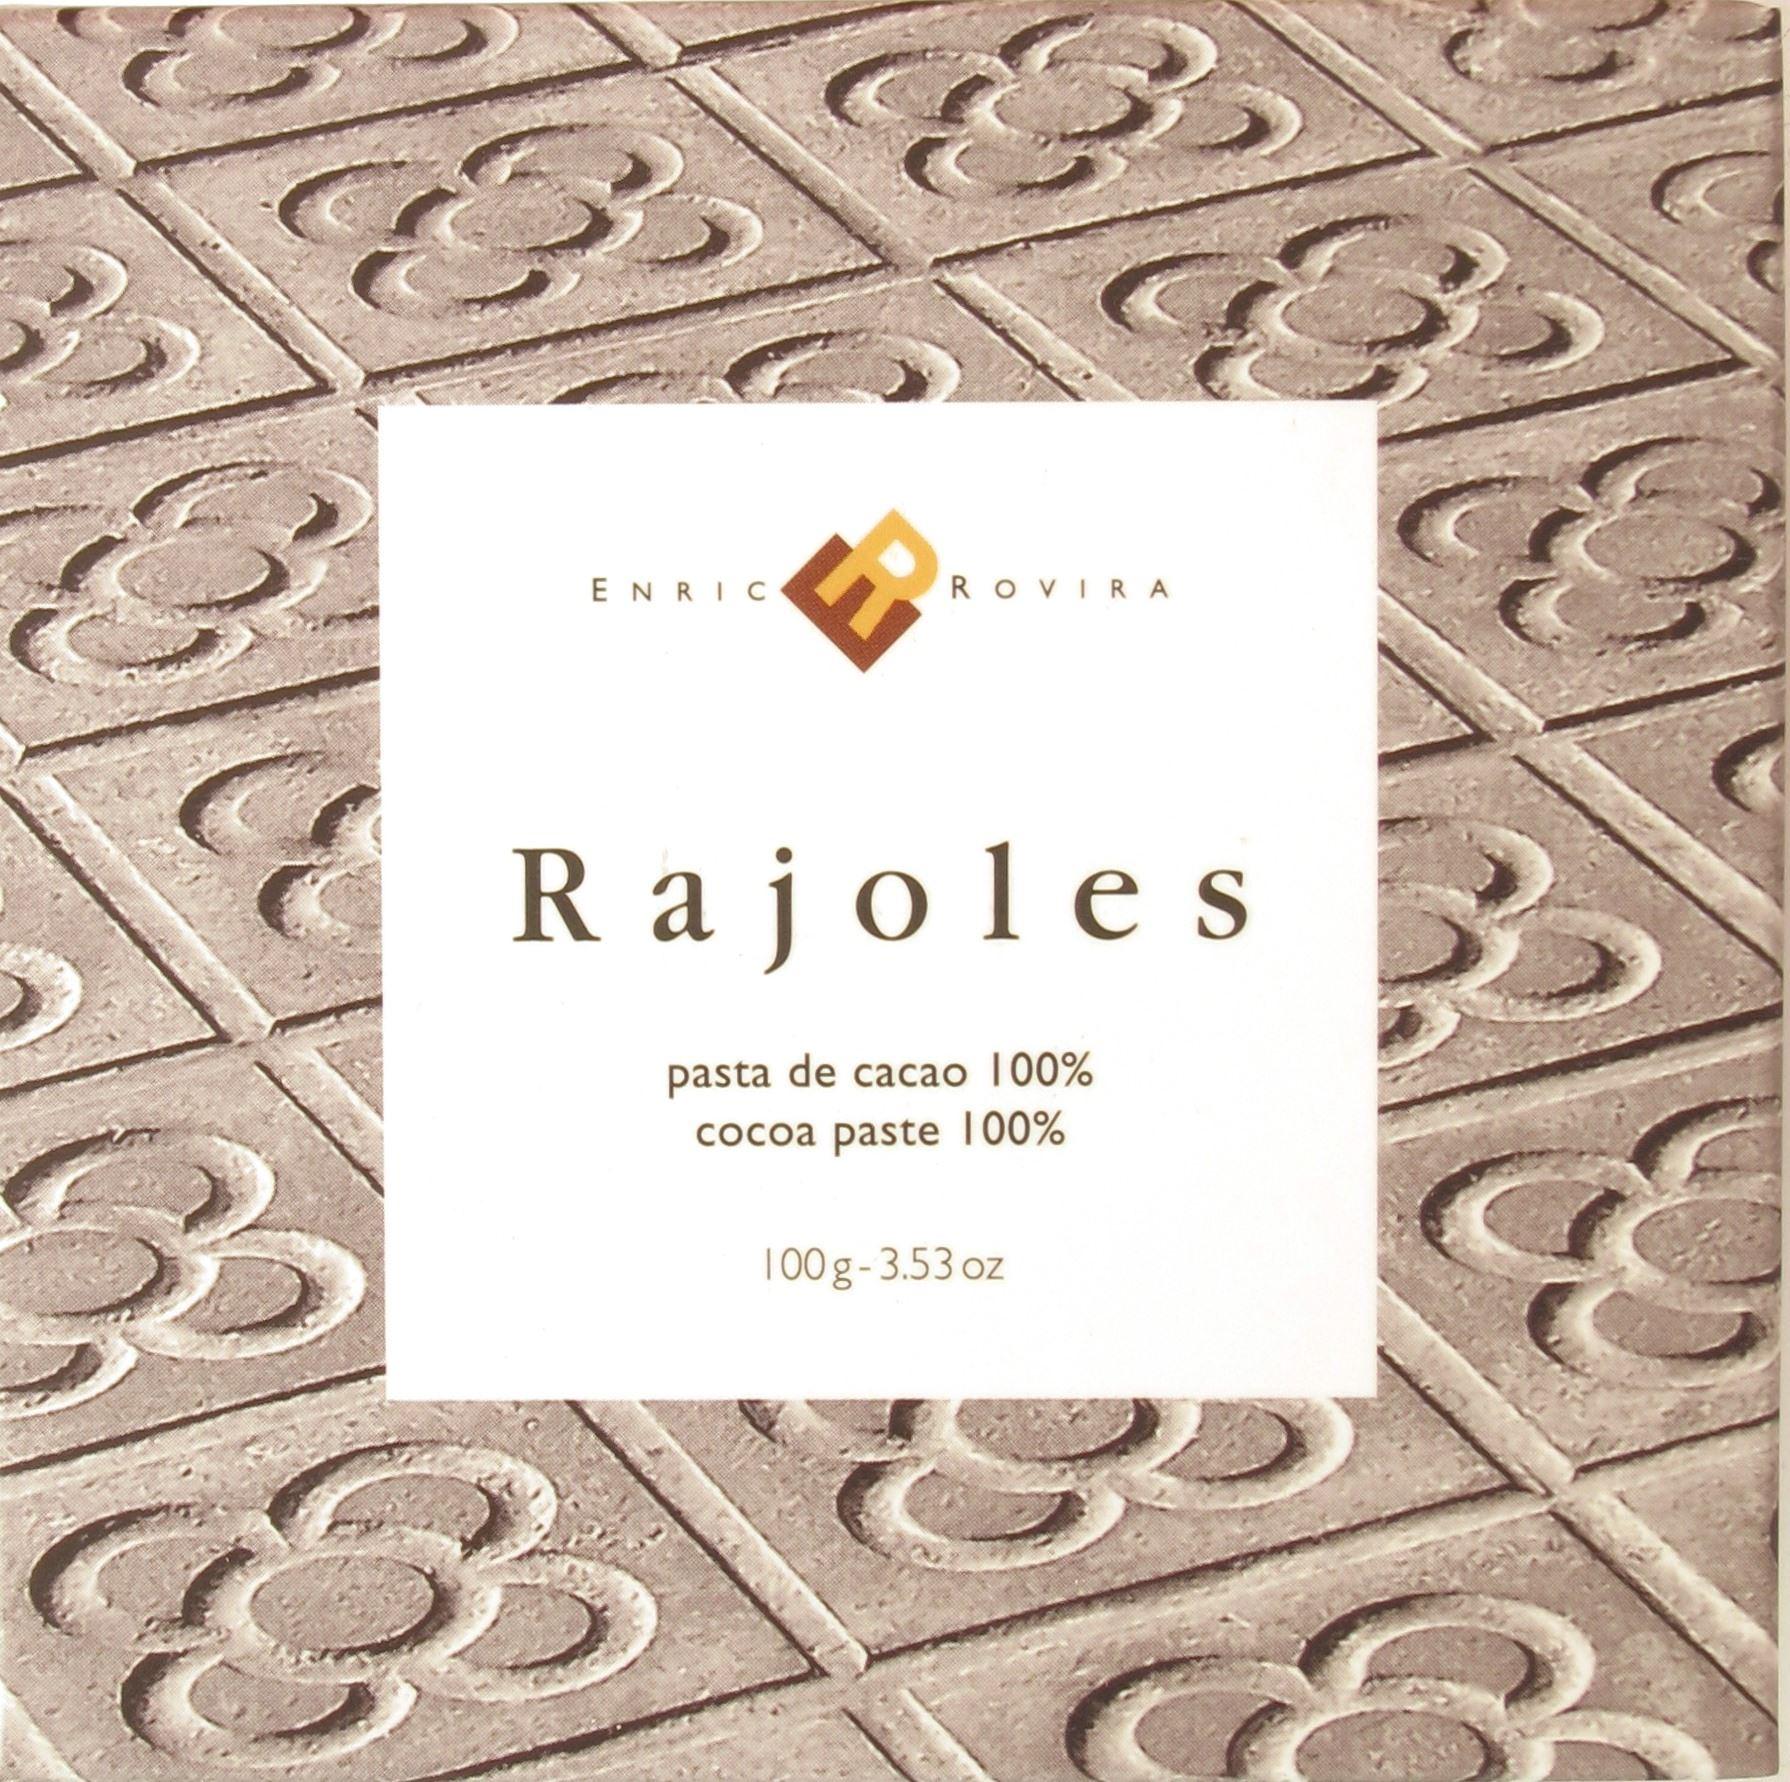 Vorderseite, Rovira Rajoles 100% Schokolade